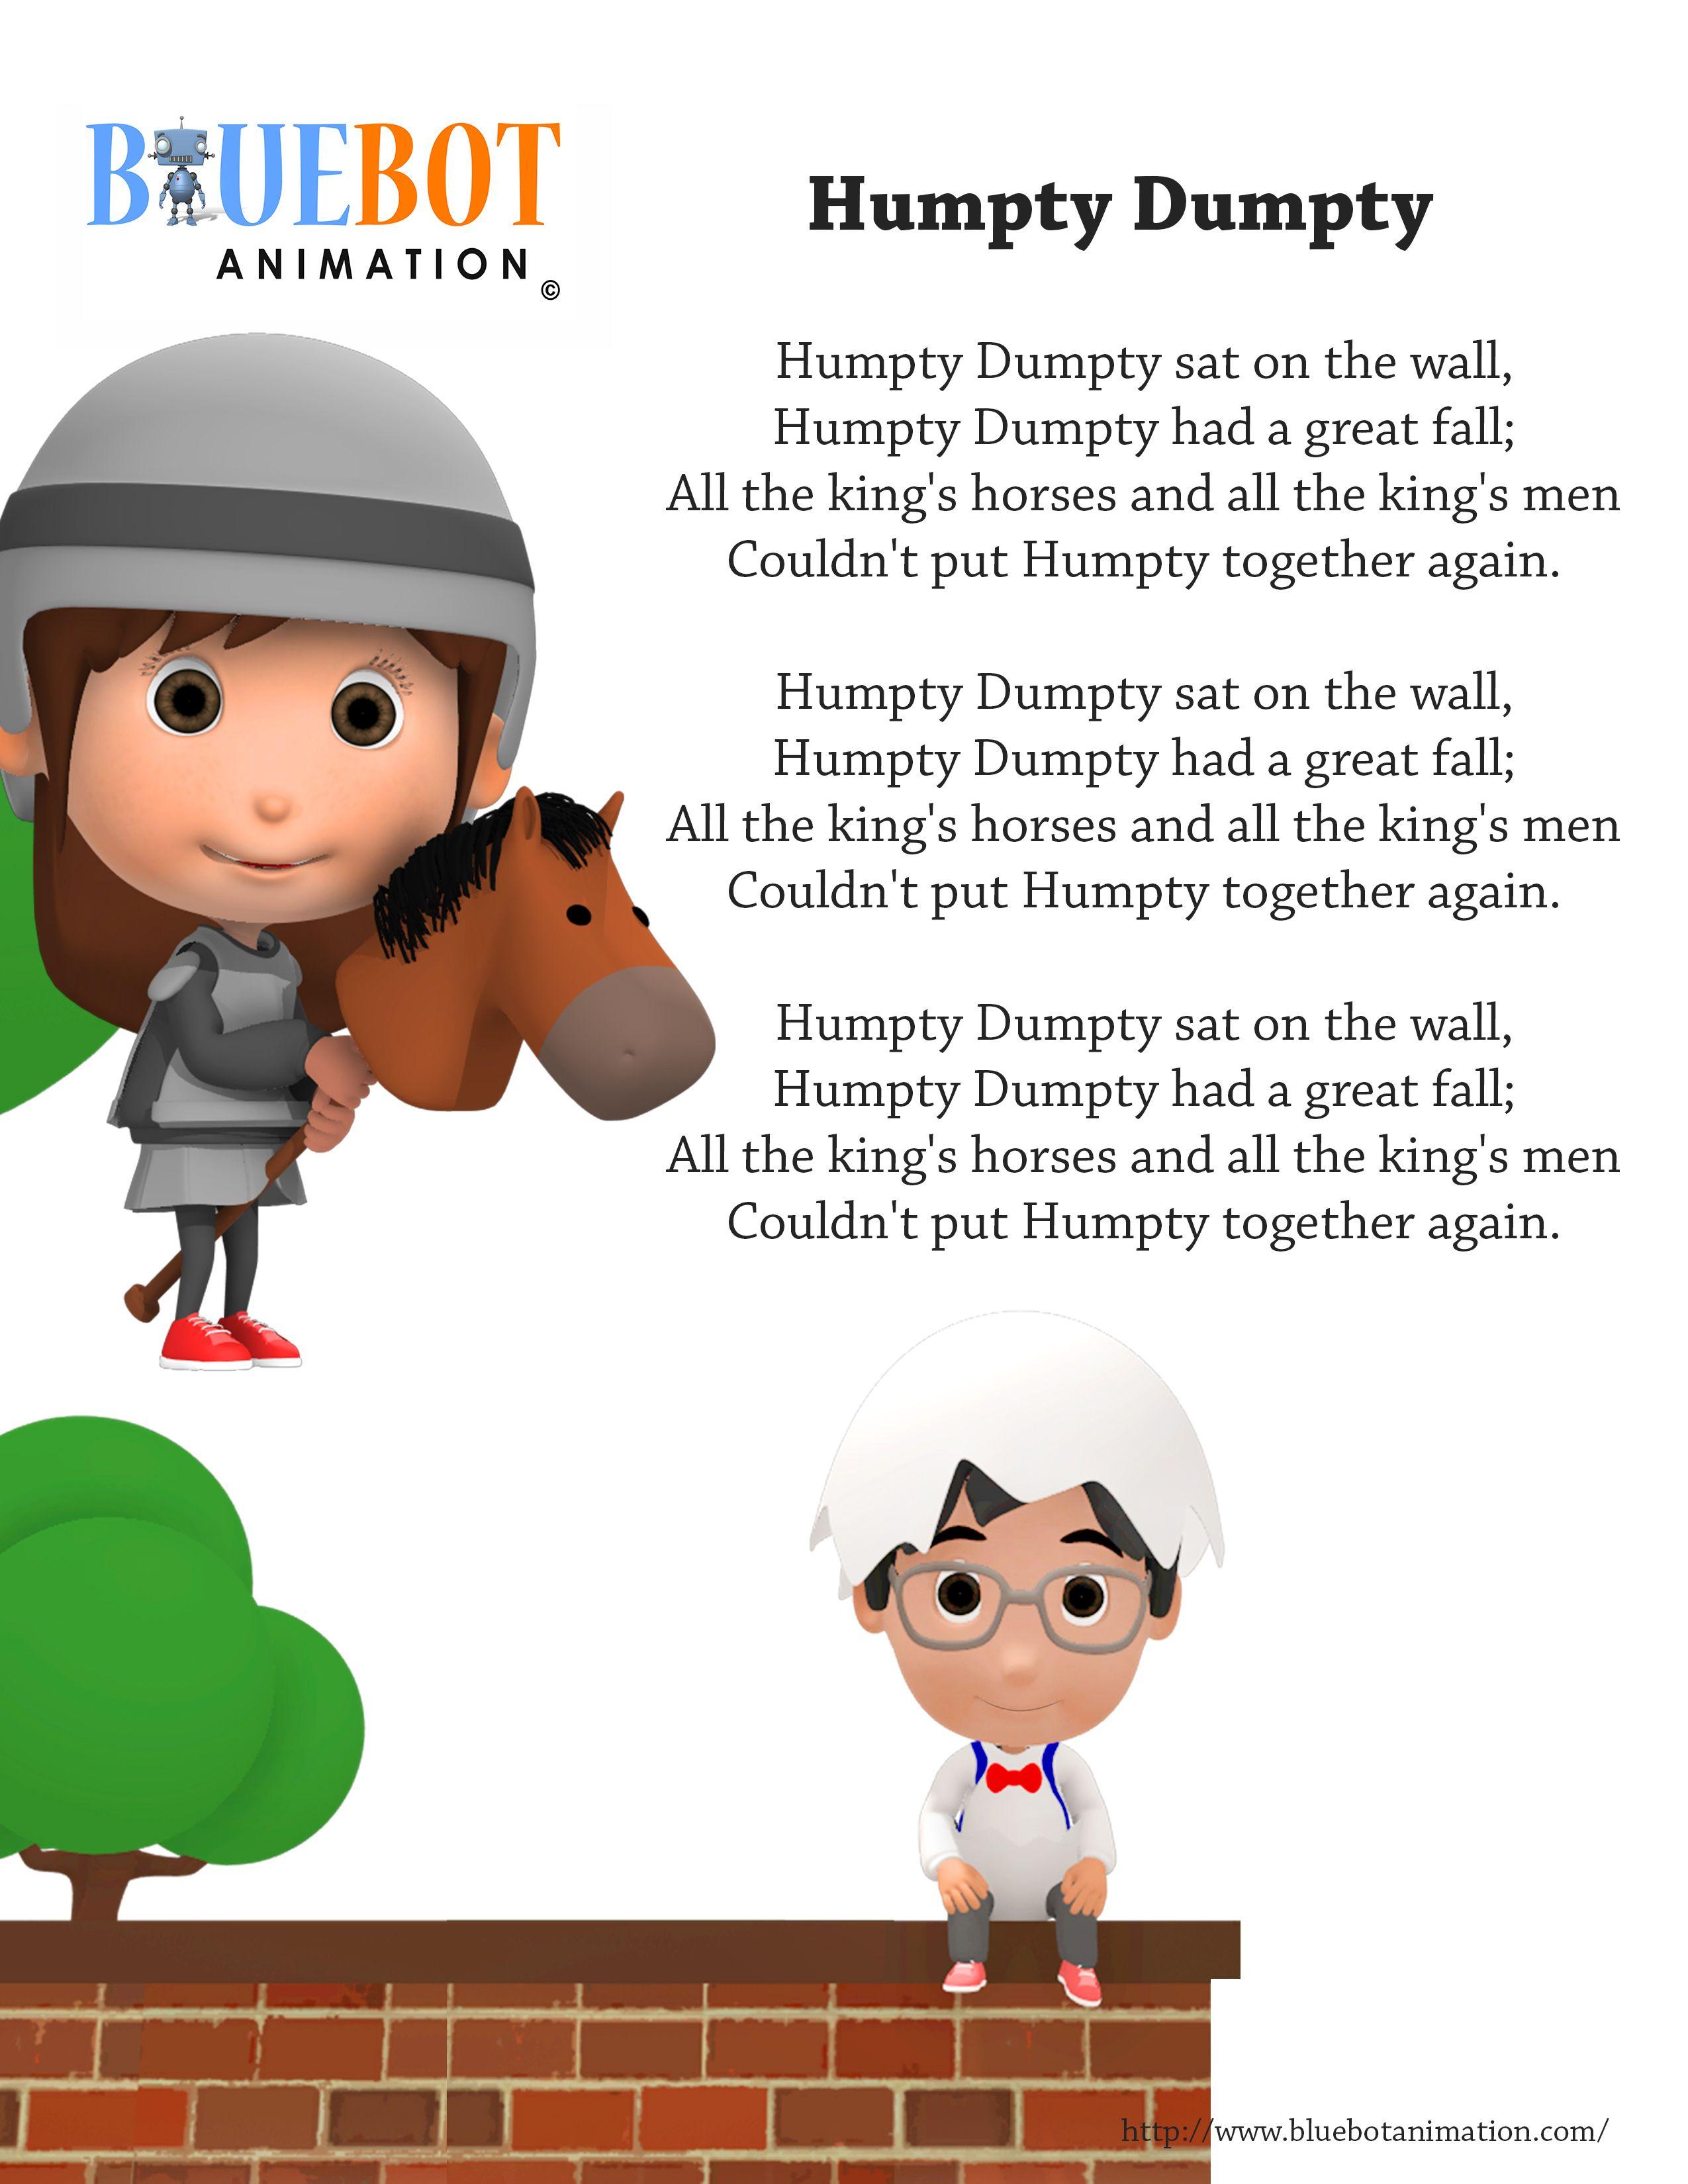 Humpty Dumpty Sat On The Wall Nursery Rhyme Lyrics Free Printable Nursery Rhyme Lyrics Page